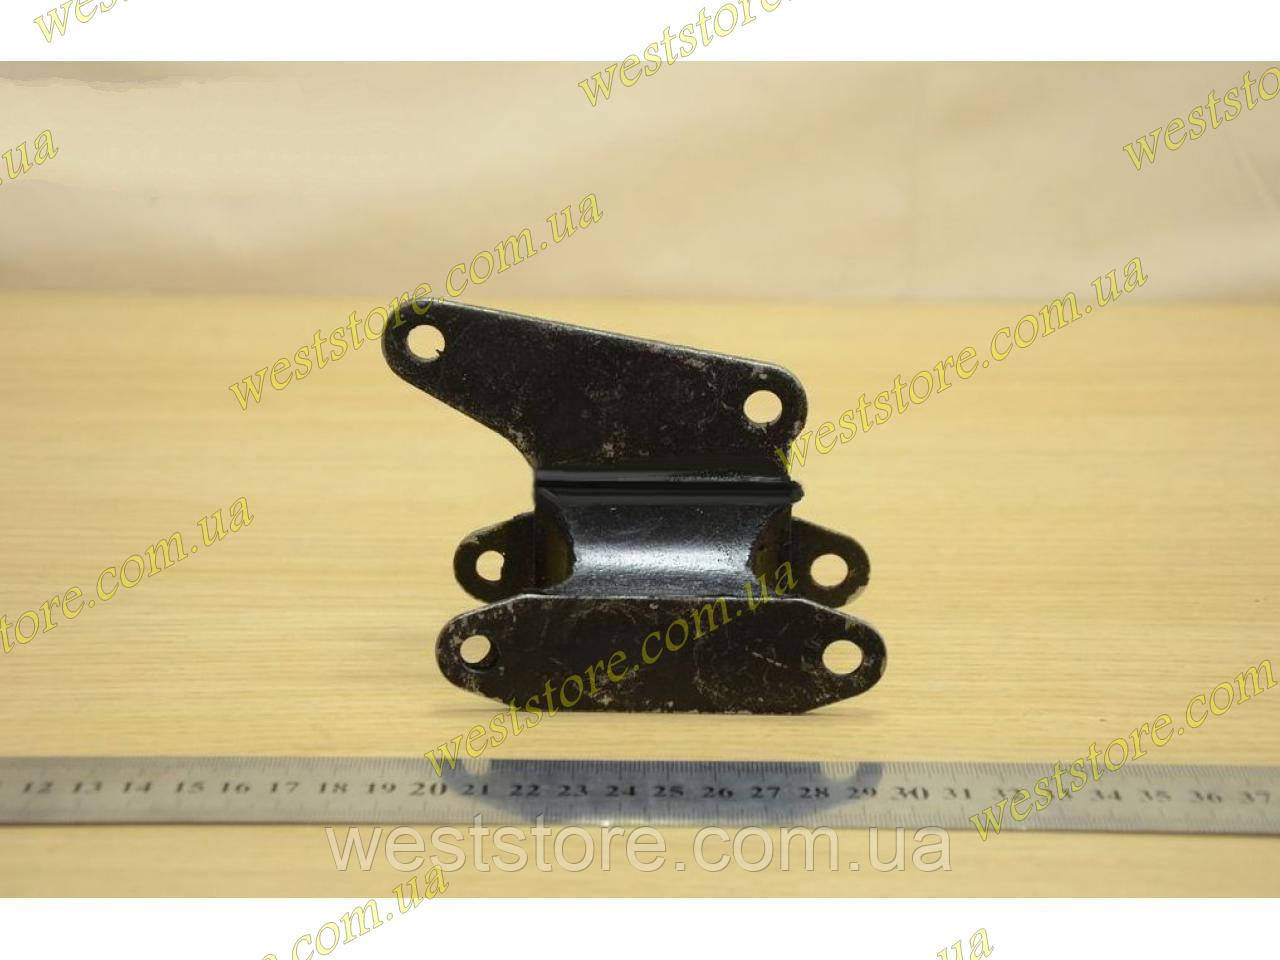 Подушка КПП Ваз 2101 2102 2103 2104 2105 2106 2107 (5-ти ступенчатая) БРТ